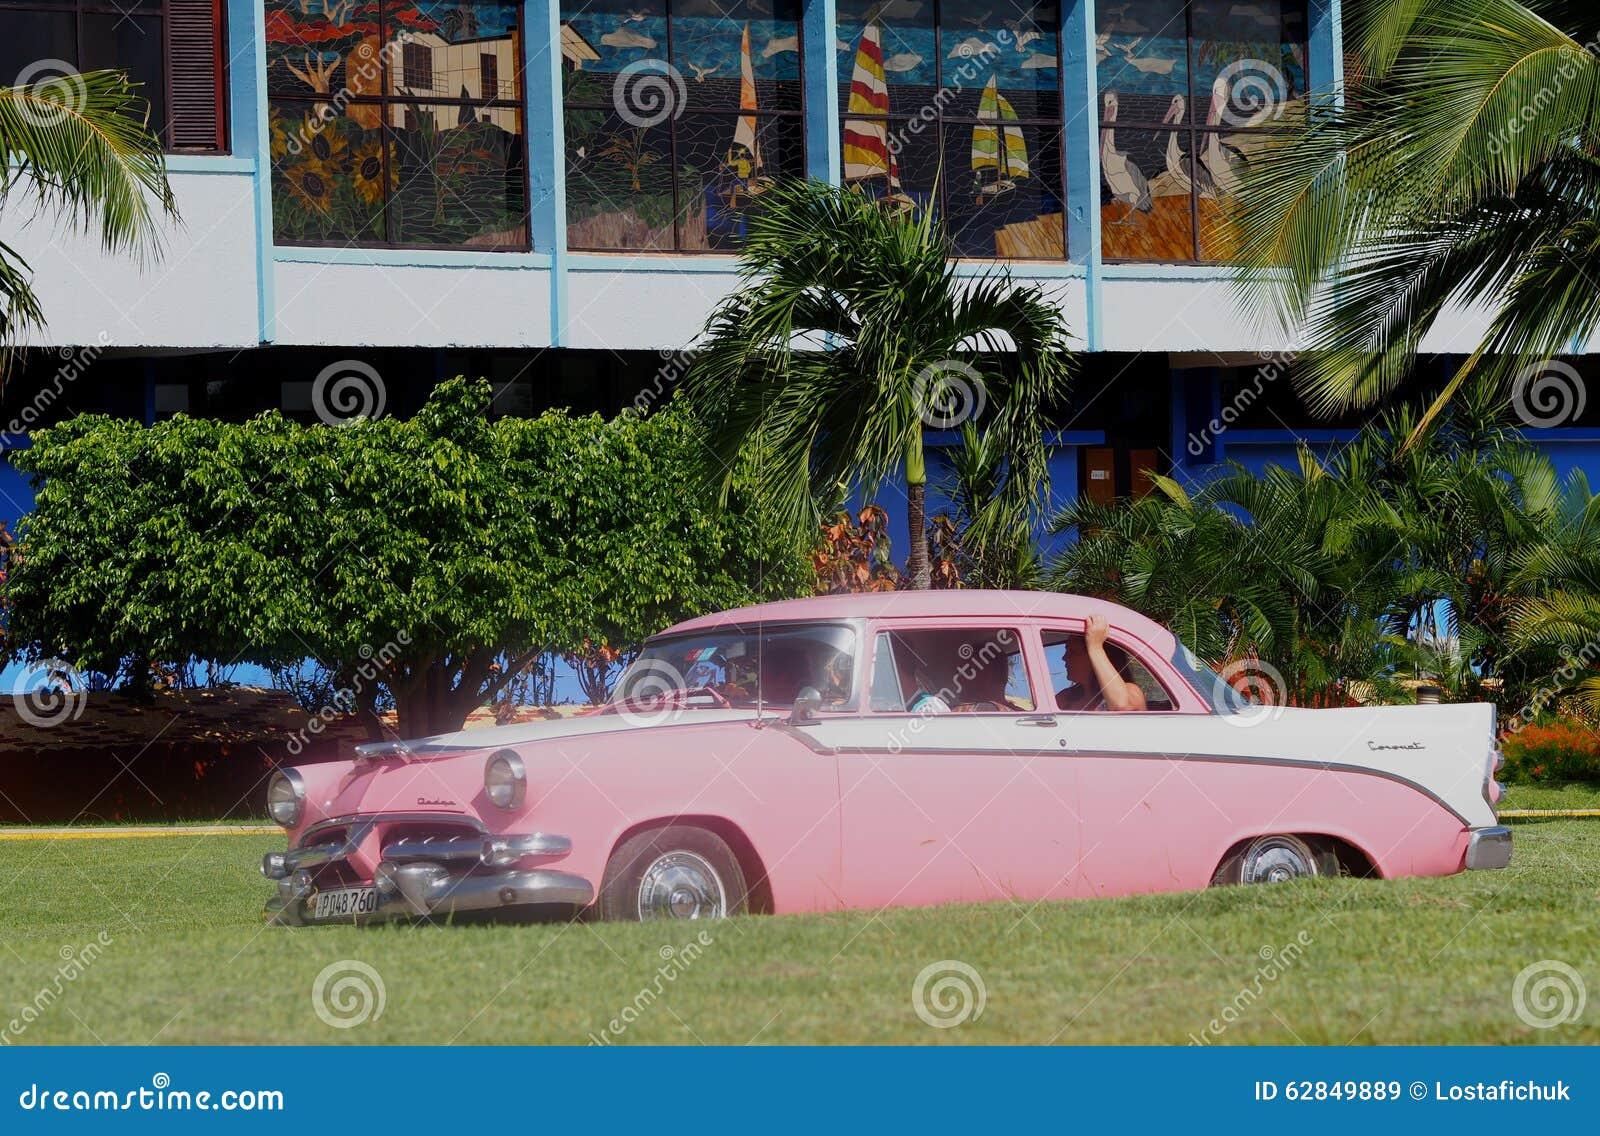 alte amerikanische autos in kuba redaktionelles stockbild bild 62849889. Black Bedroom Furniture Sets. Home Design Ideas